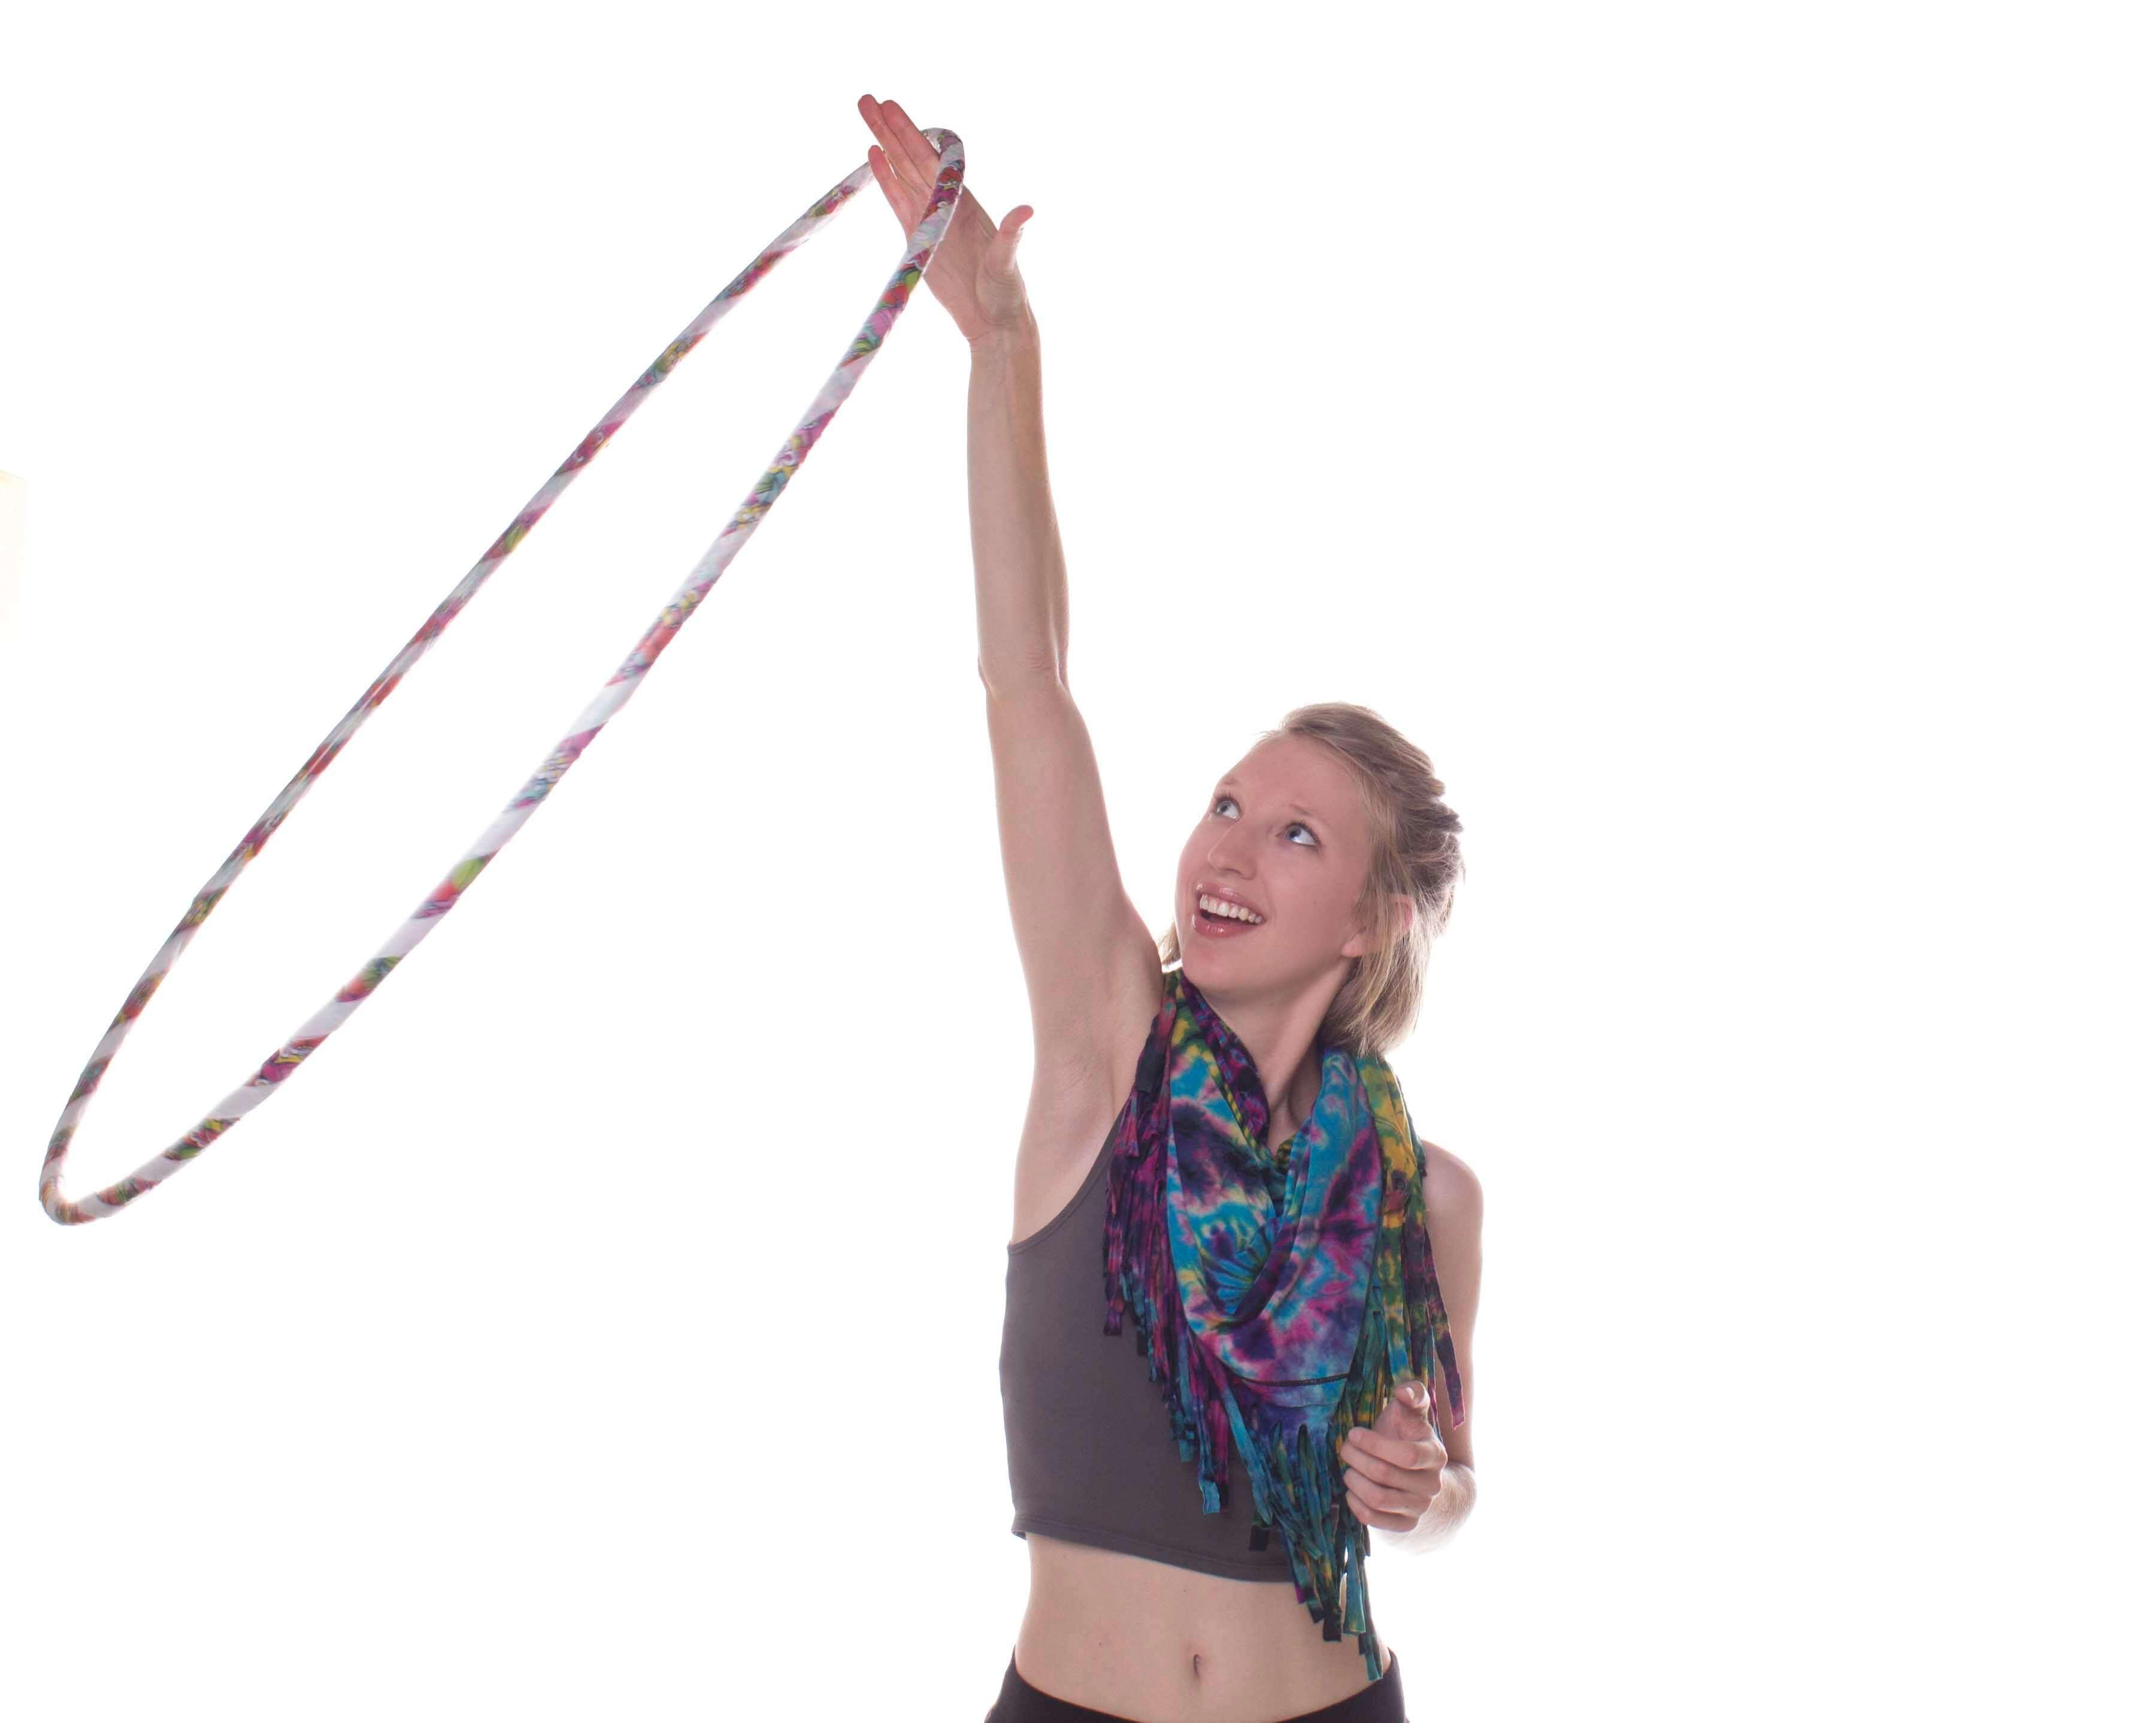 IMG 8653 - How to Make a Hula Hoop - DIY Hula Hoop